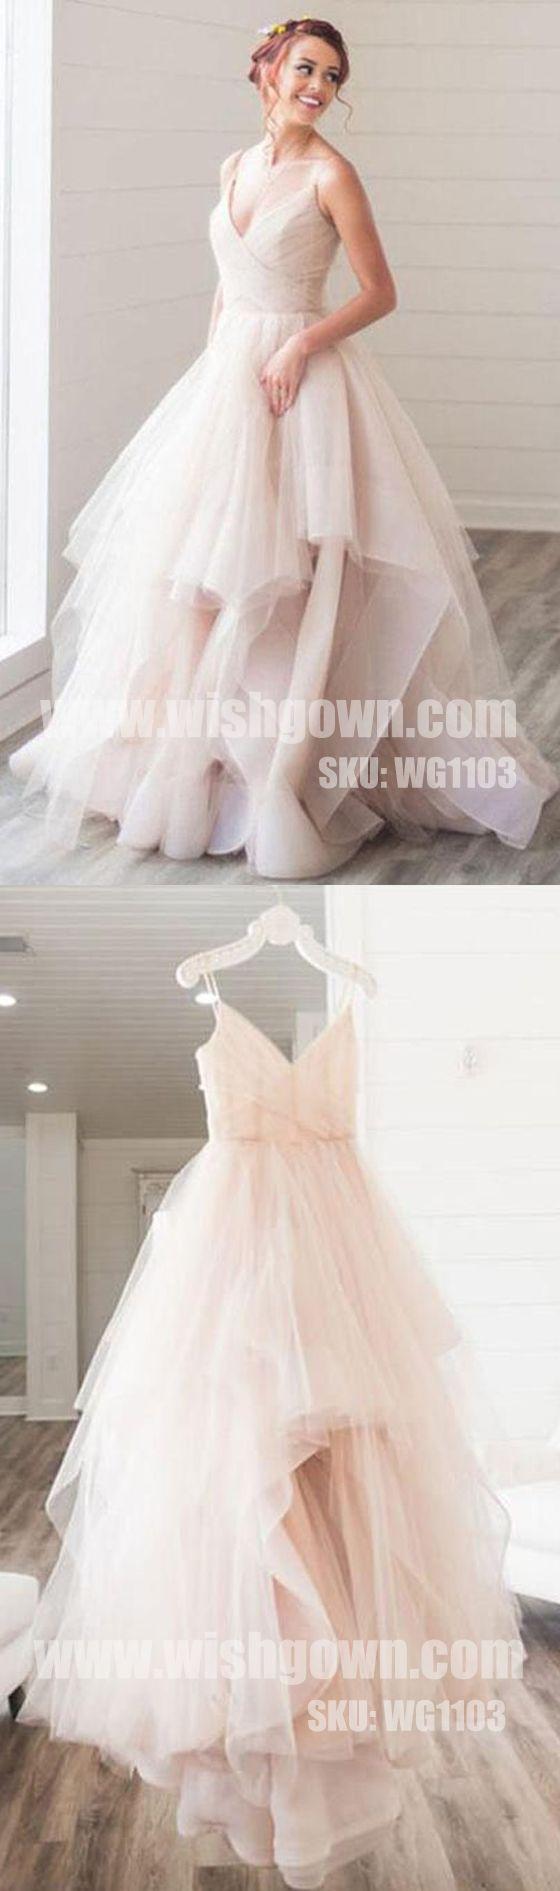 Elegant popular simpletulle evening chic cheap long prom dresses